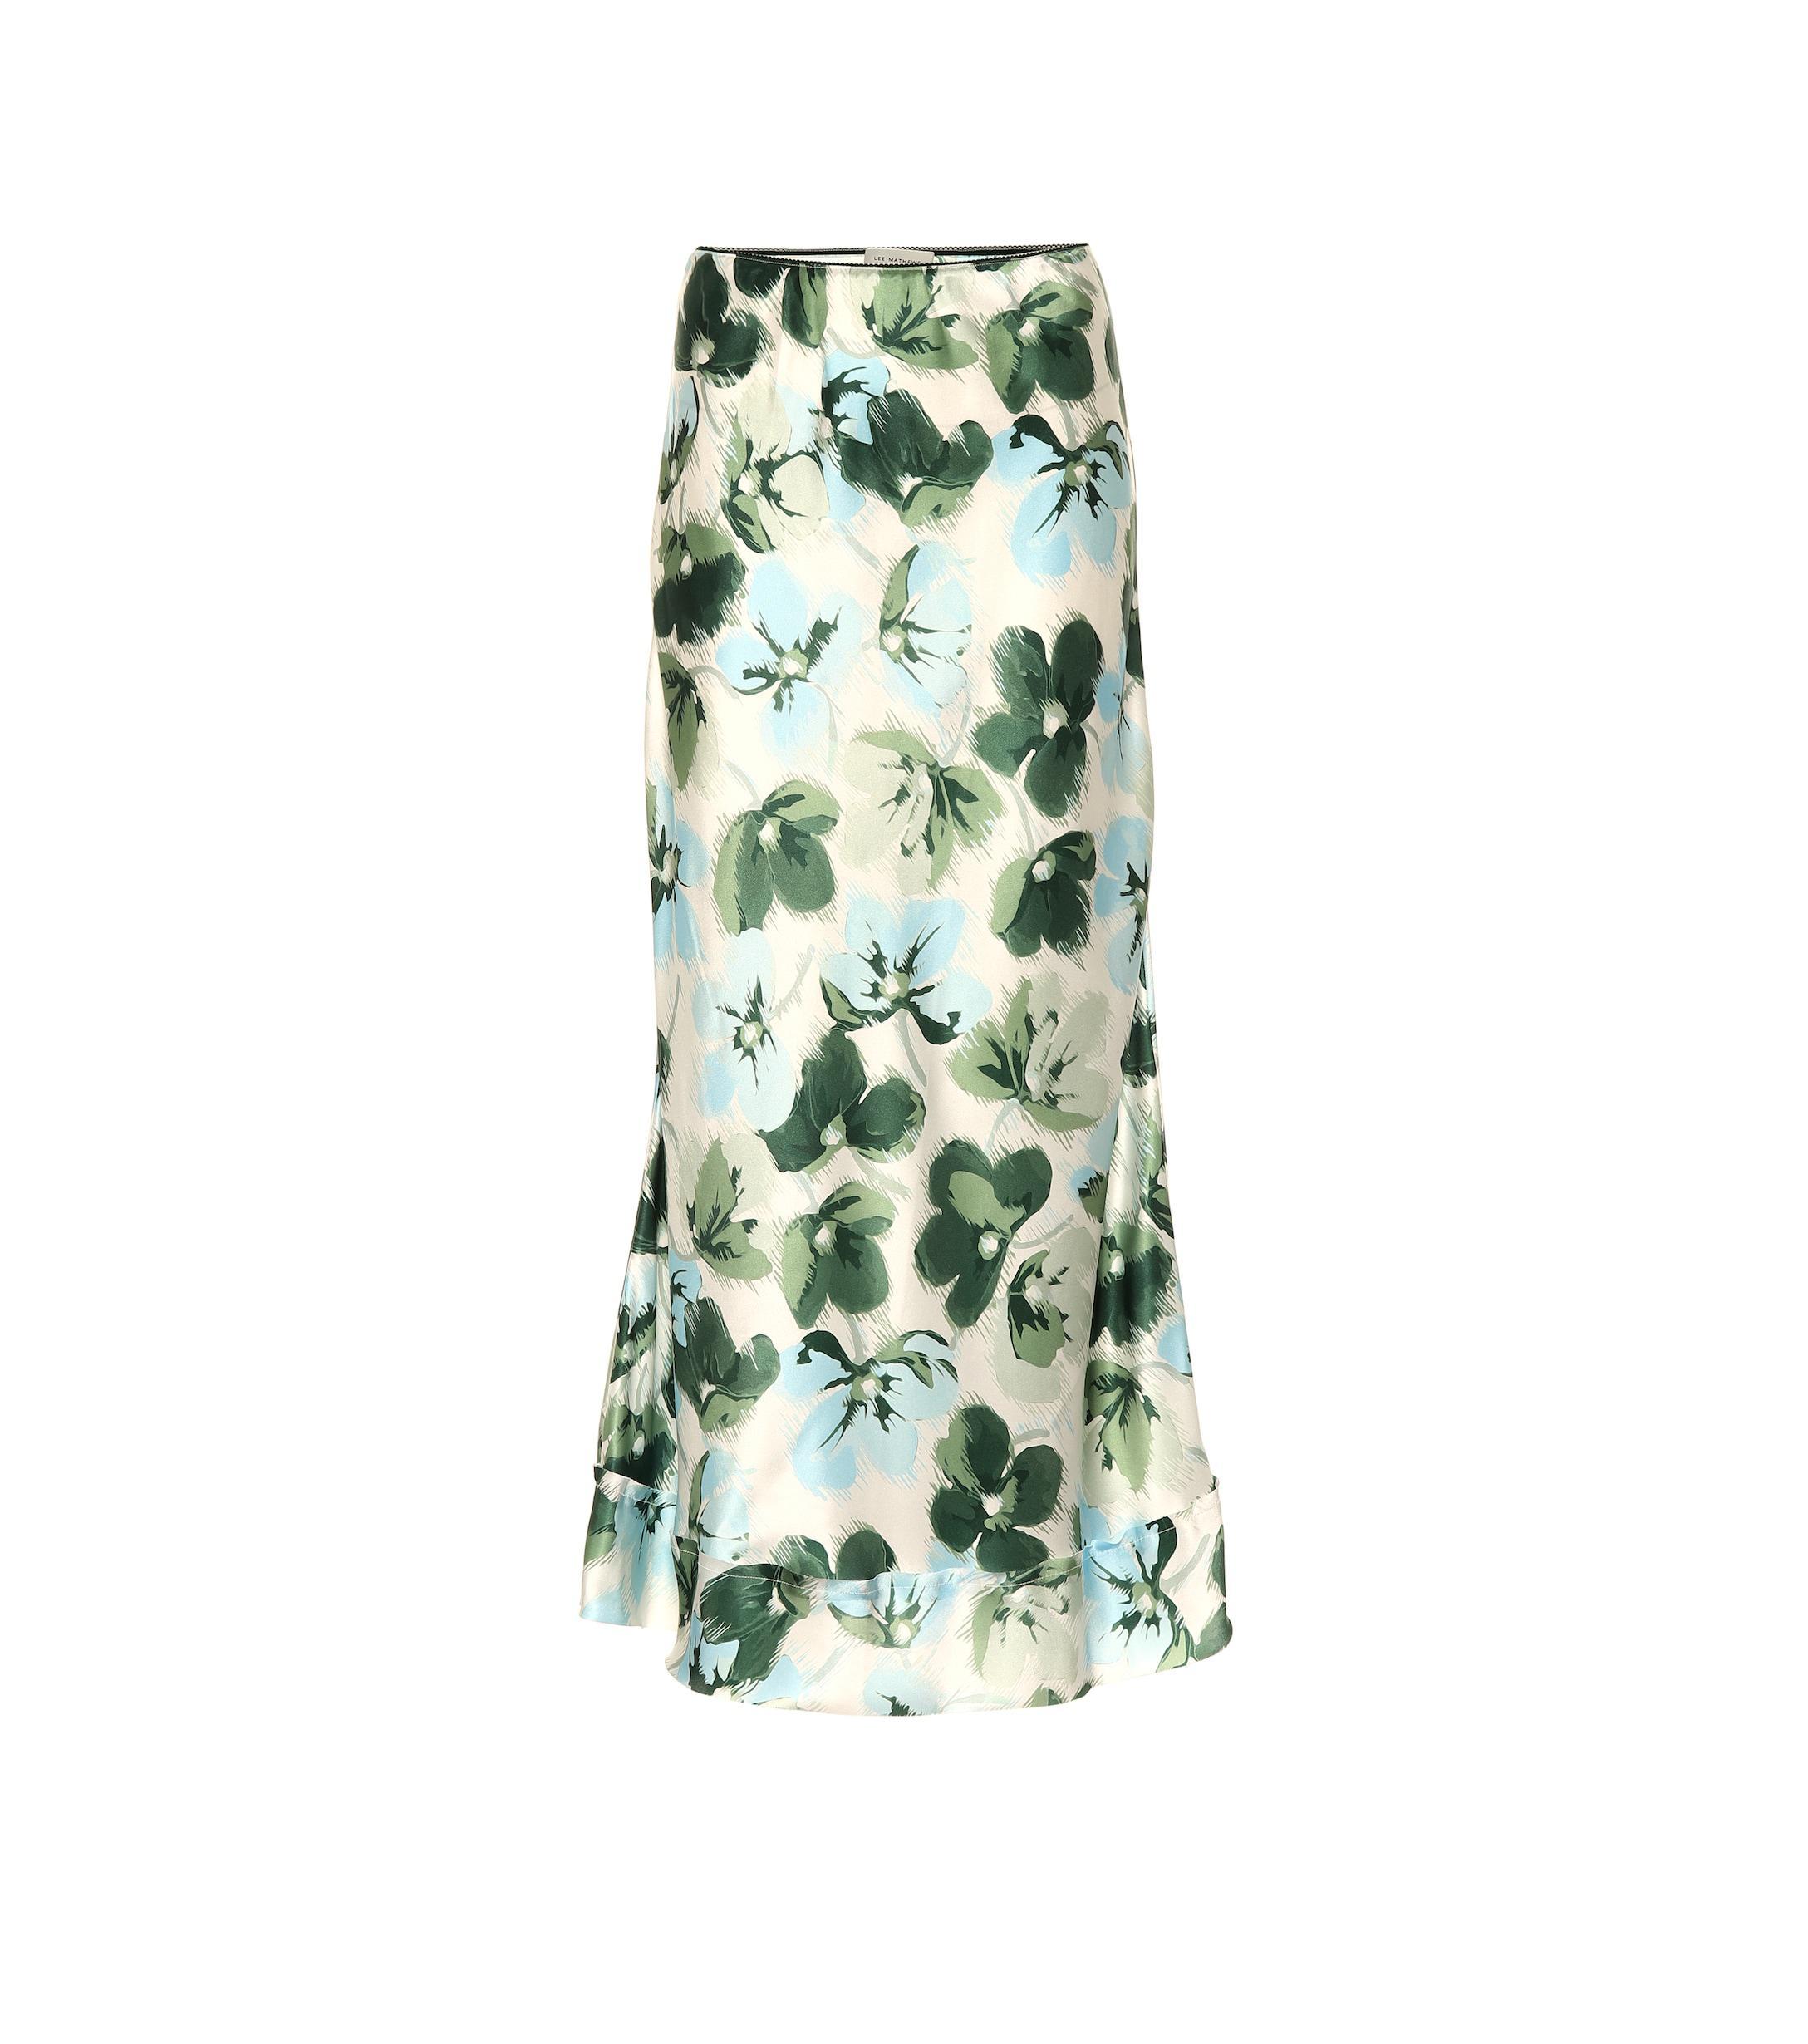 3339a7484 Falda de seda floral Lee Mathews de color Verde - Lyst